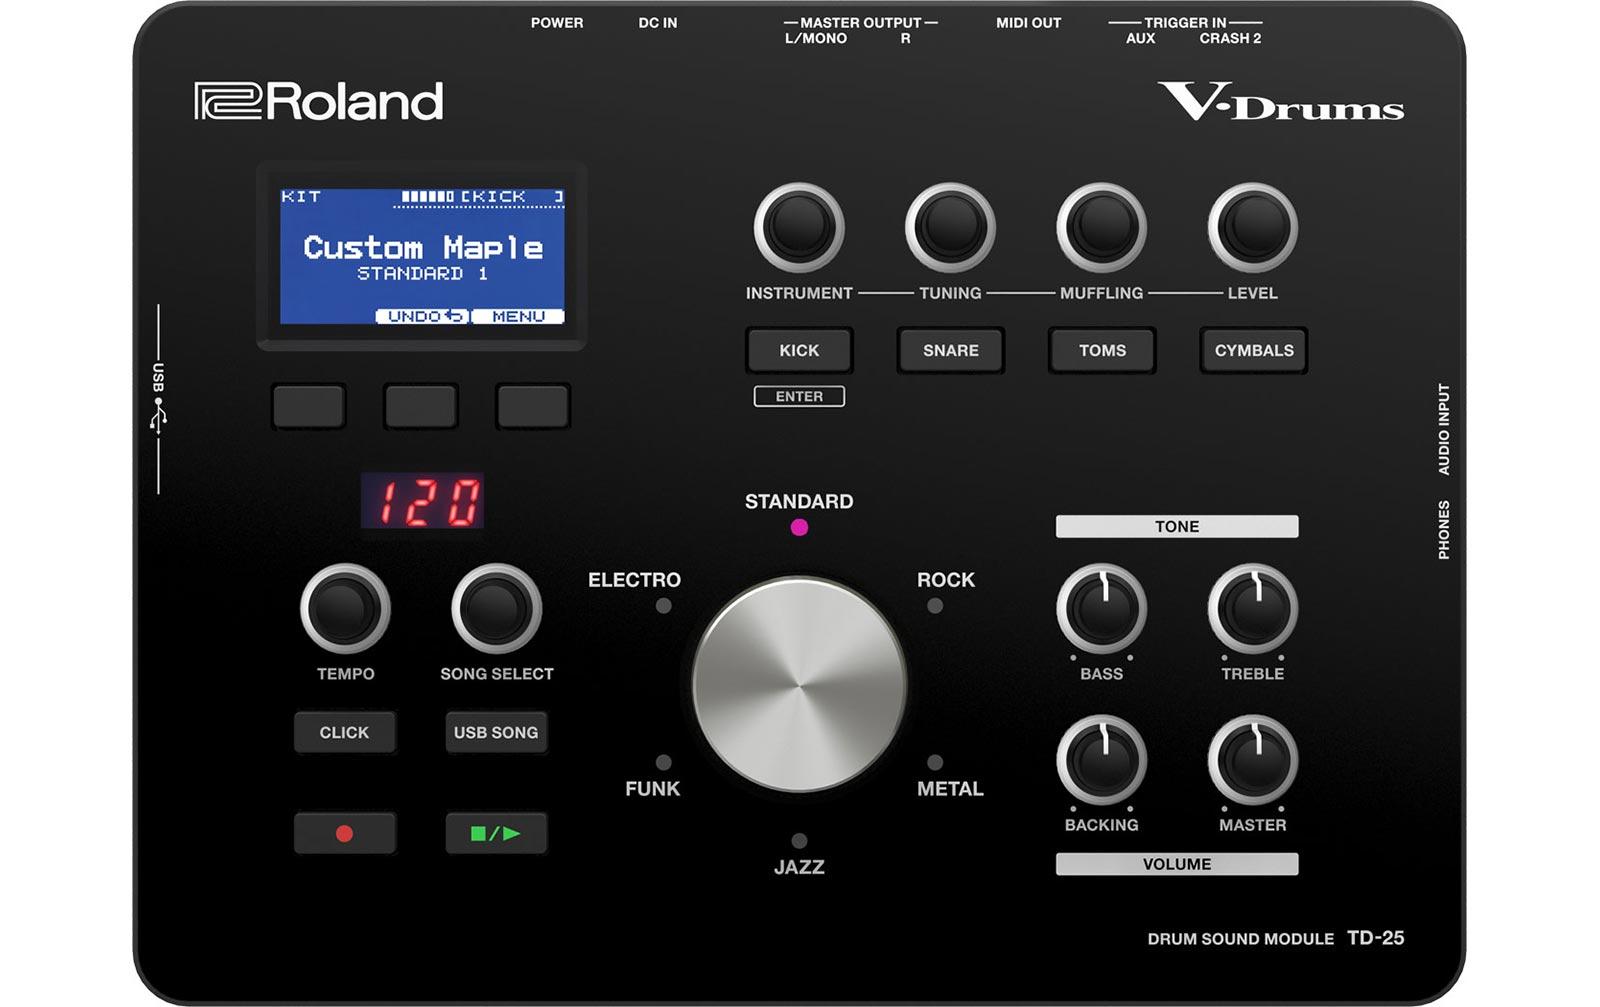 roland-td-25-v-drum-modul